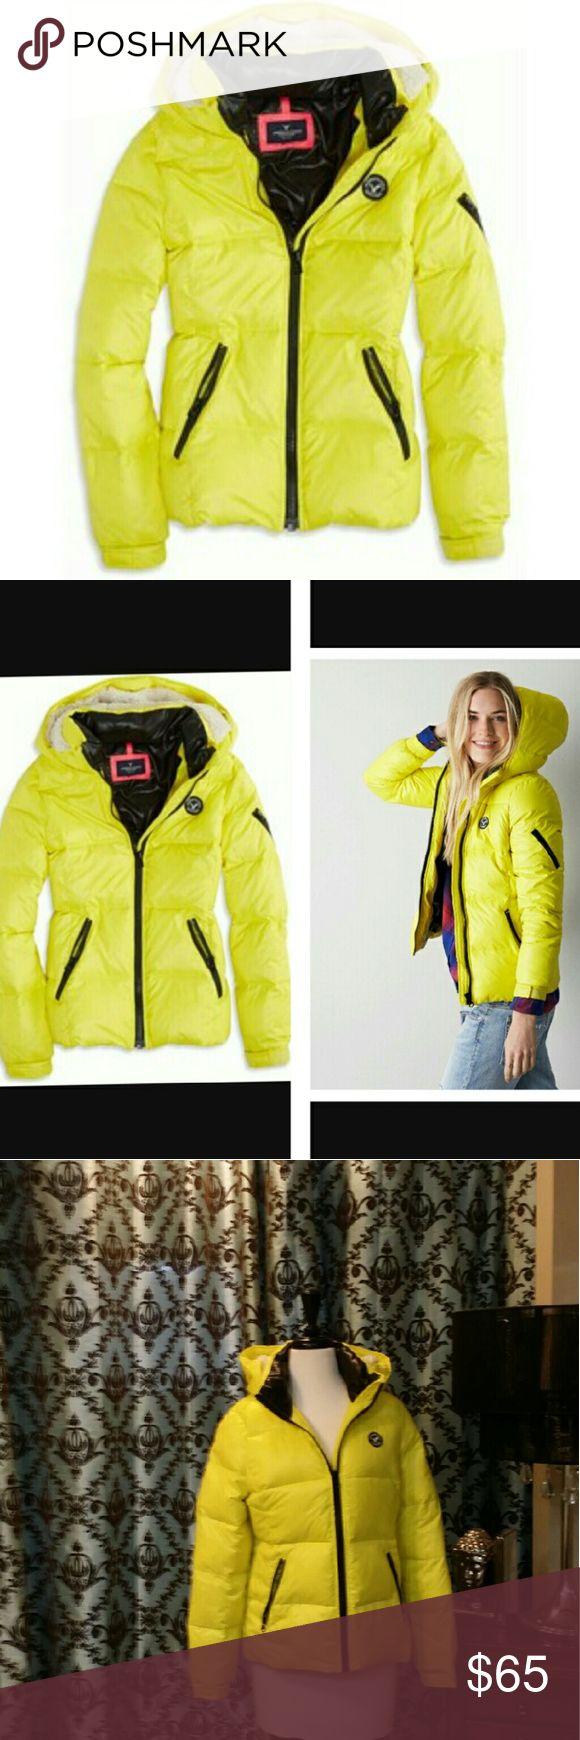 🎈SALE🎈American Eagle Yellow Down Jacket American Eagle Yellow Down Jacket with Hood Jackets & Coats